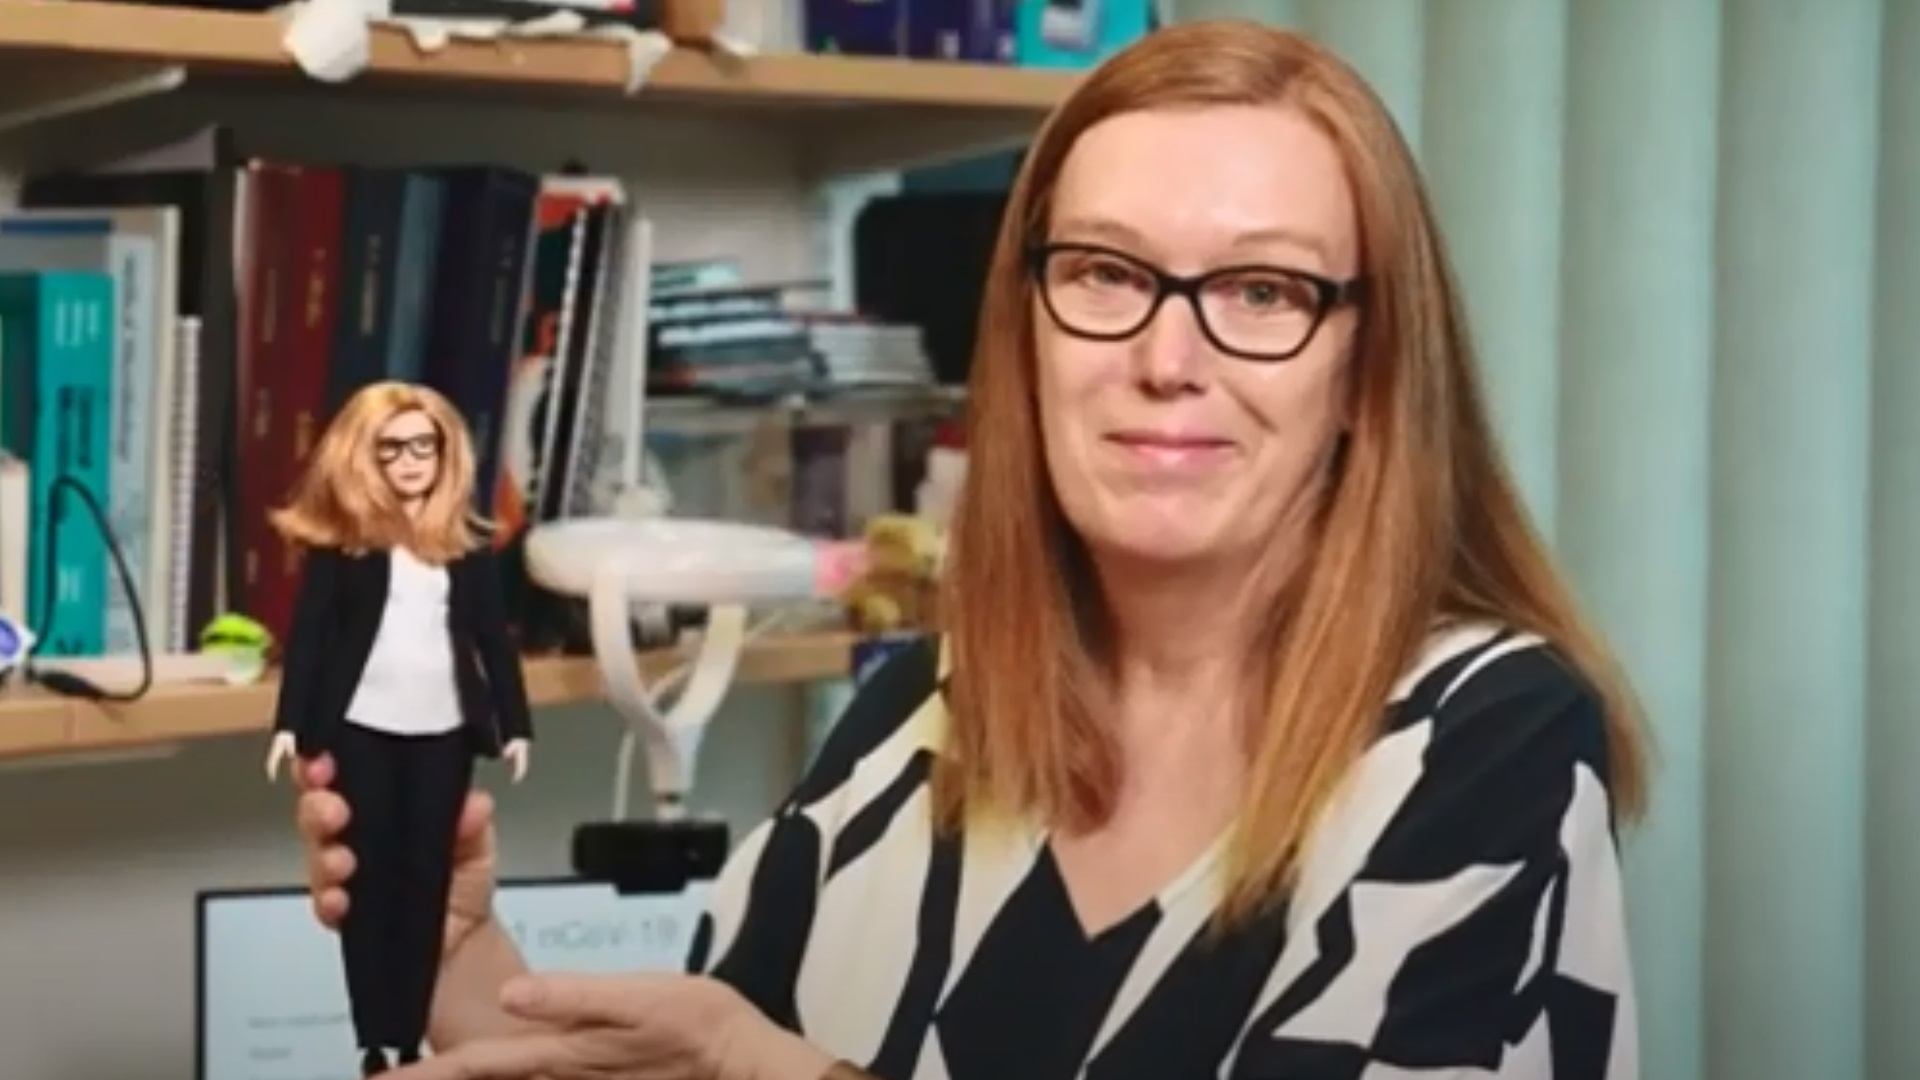 Barbie: Η δημιουργός του εμβολίου της AstraZeneca γίνεται κούκλα